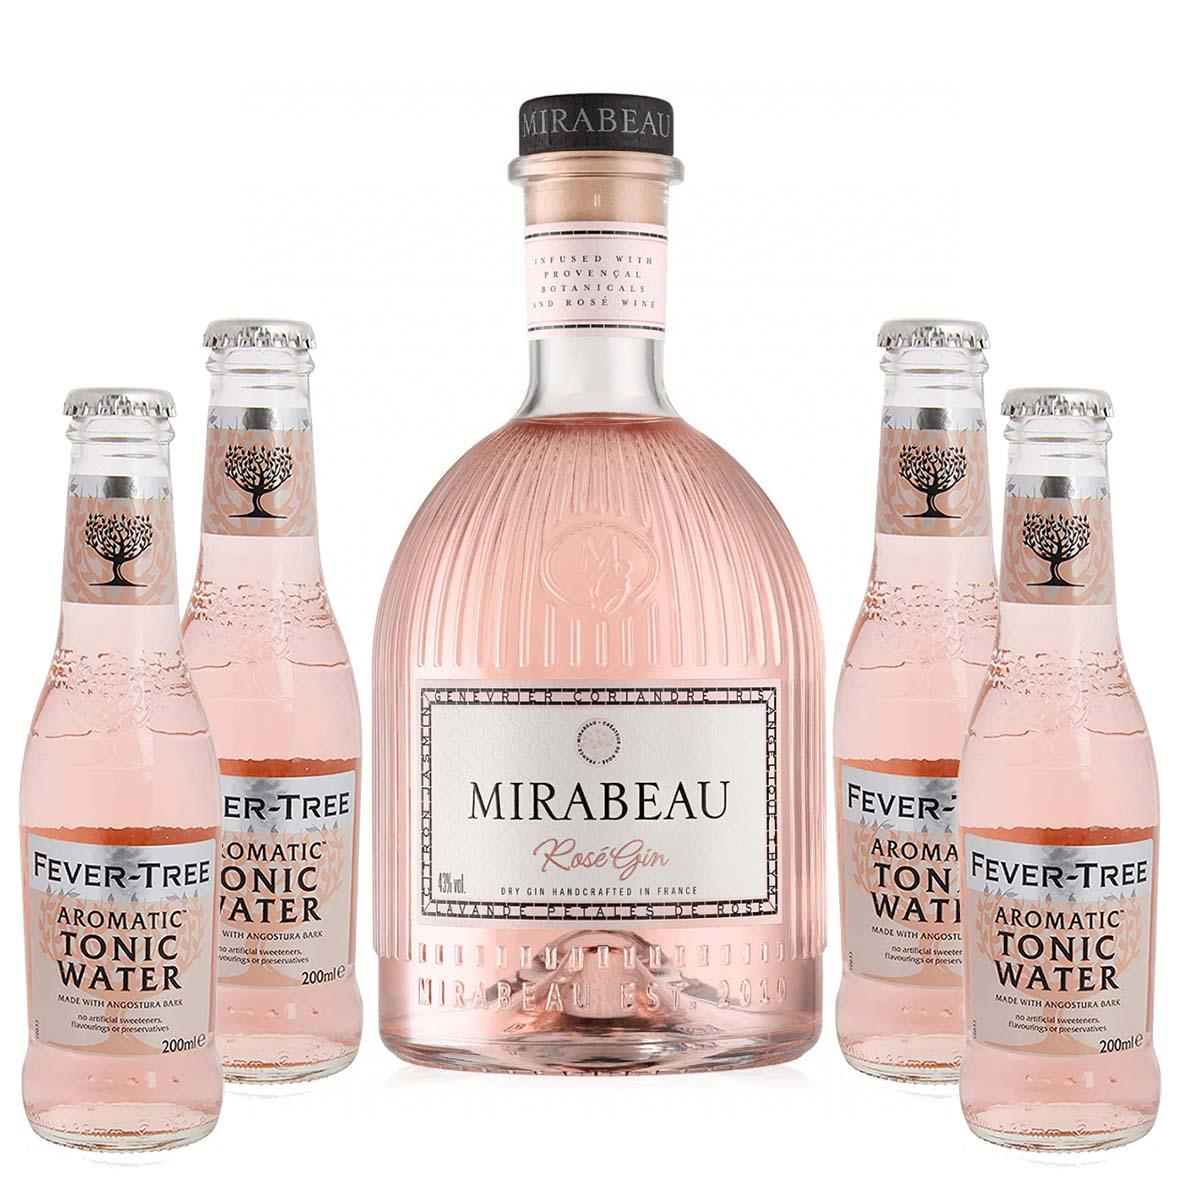 Mirabeau Rose Gin - Fever Tree Aromatic Pakke